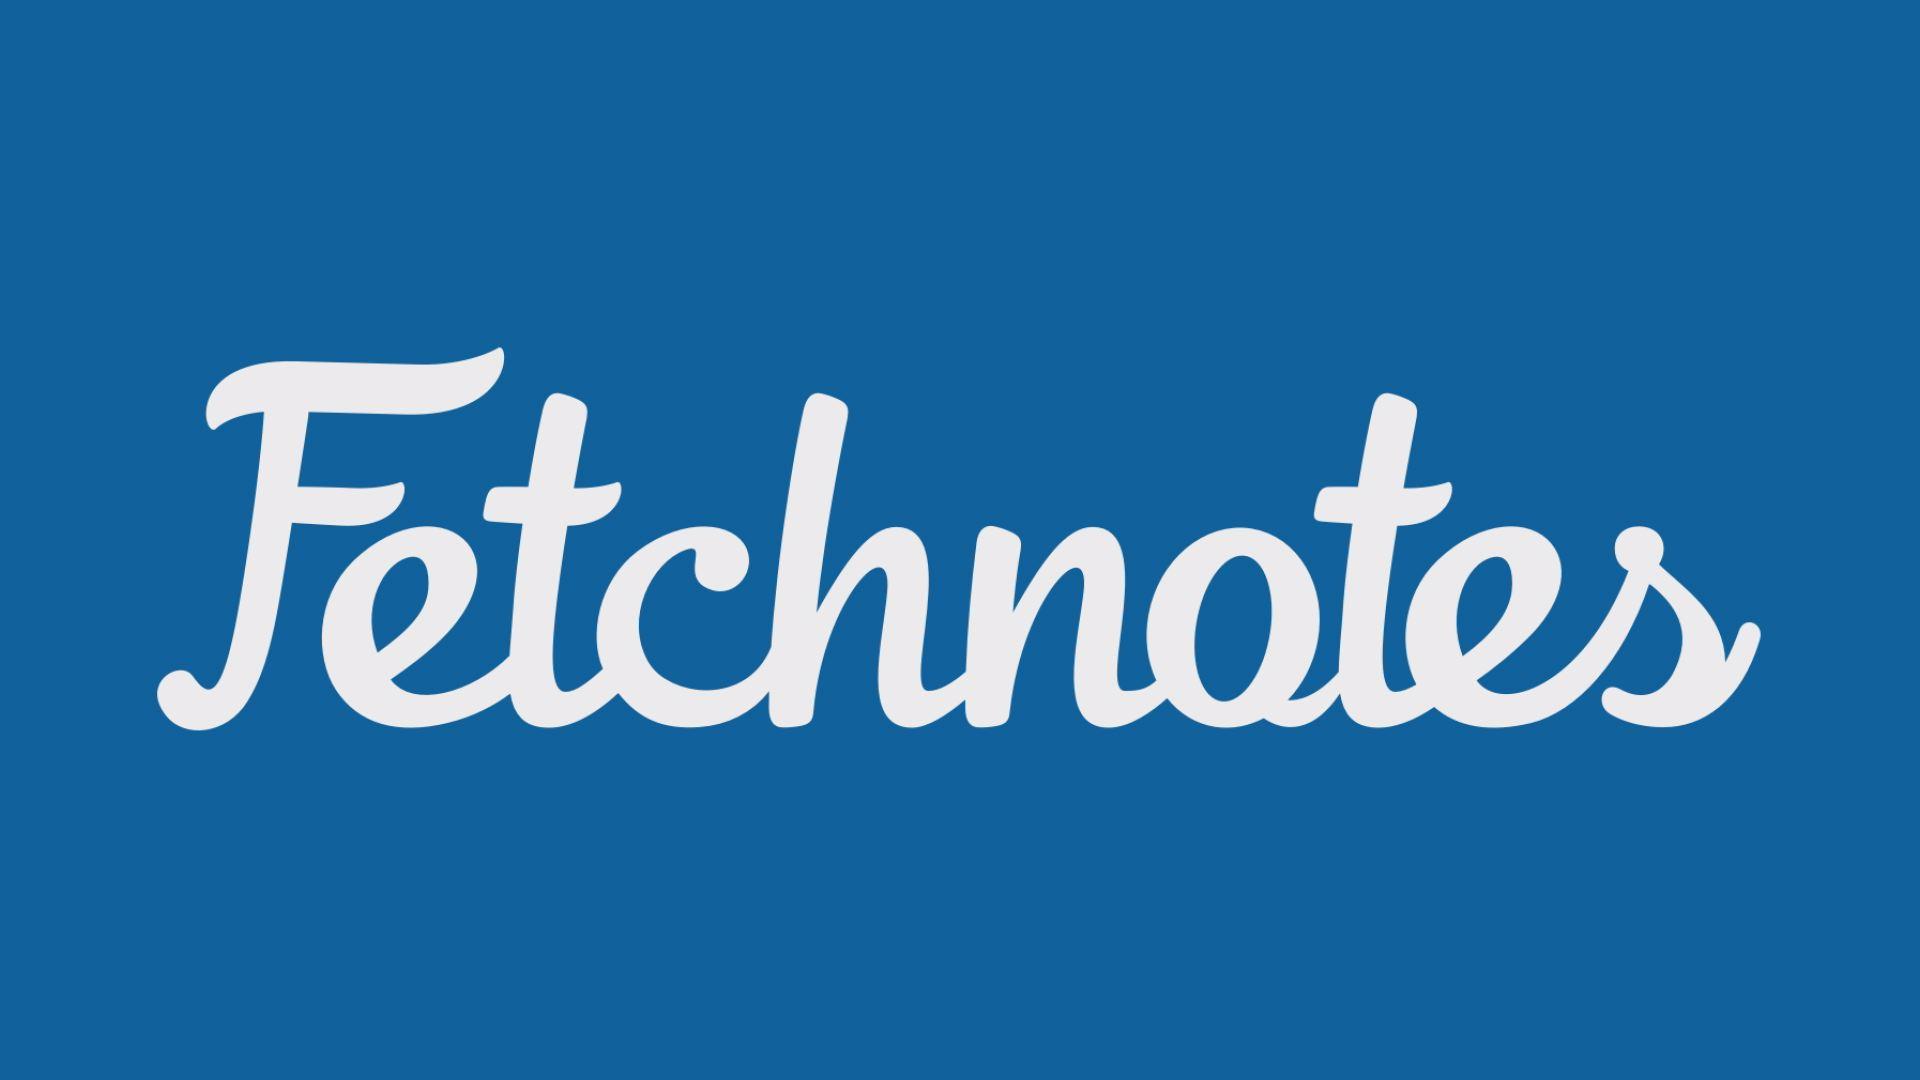 معرفی اپلیکیشن Fetch Notes – تک تاکس – techtalks.ir